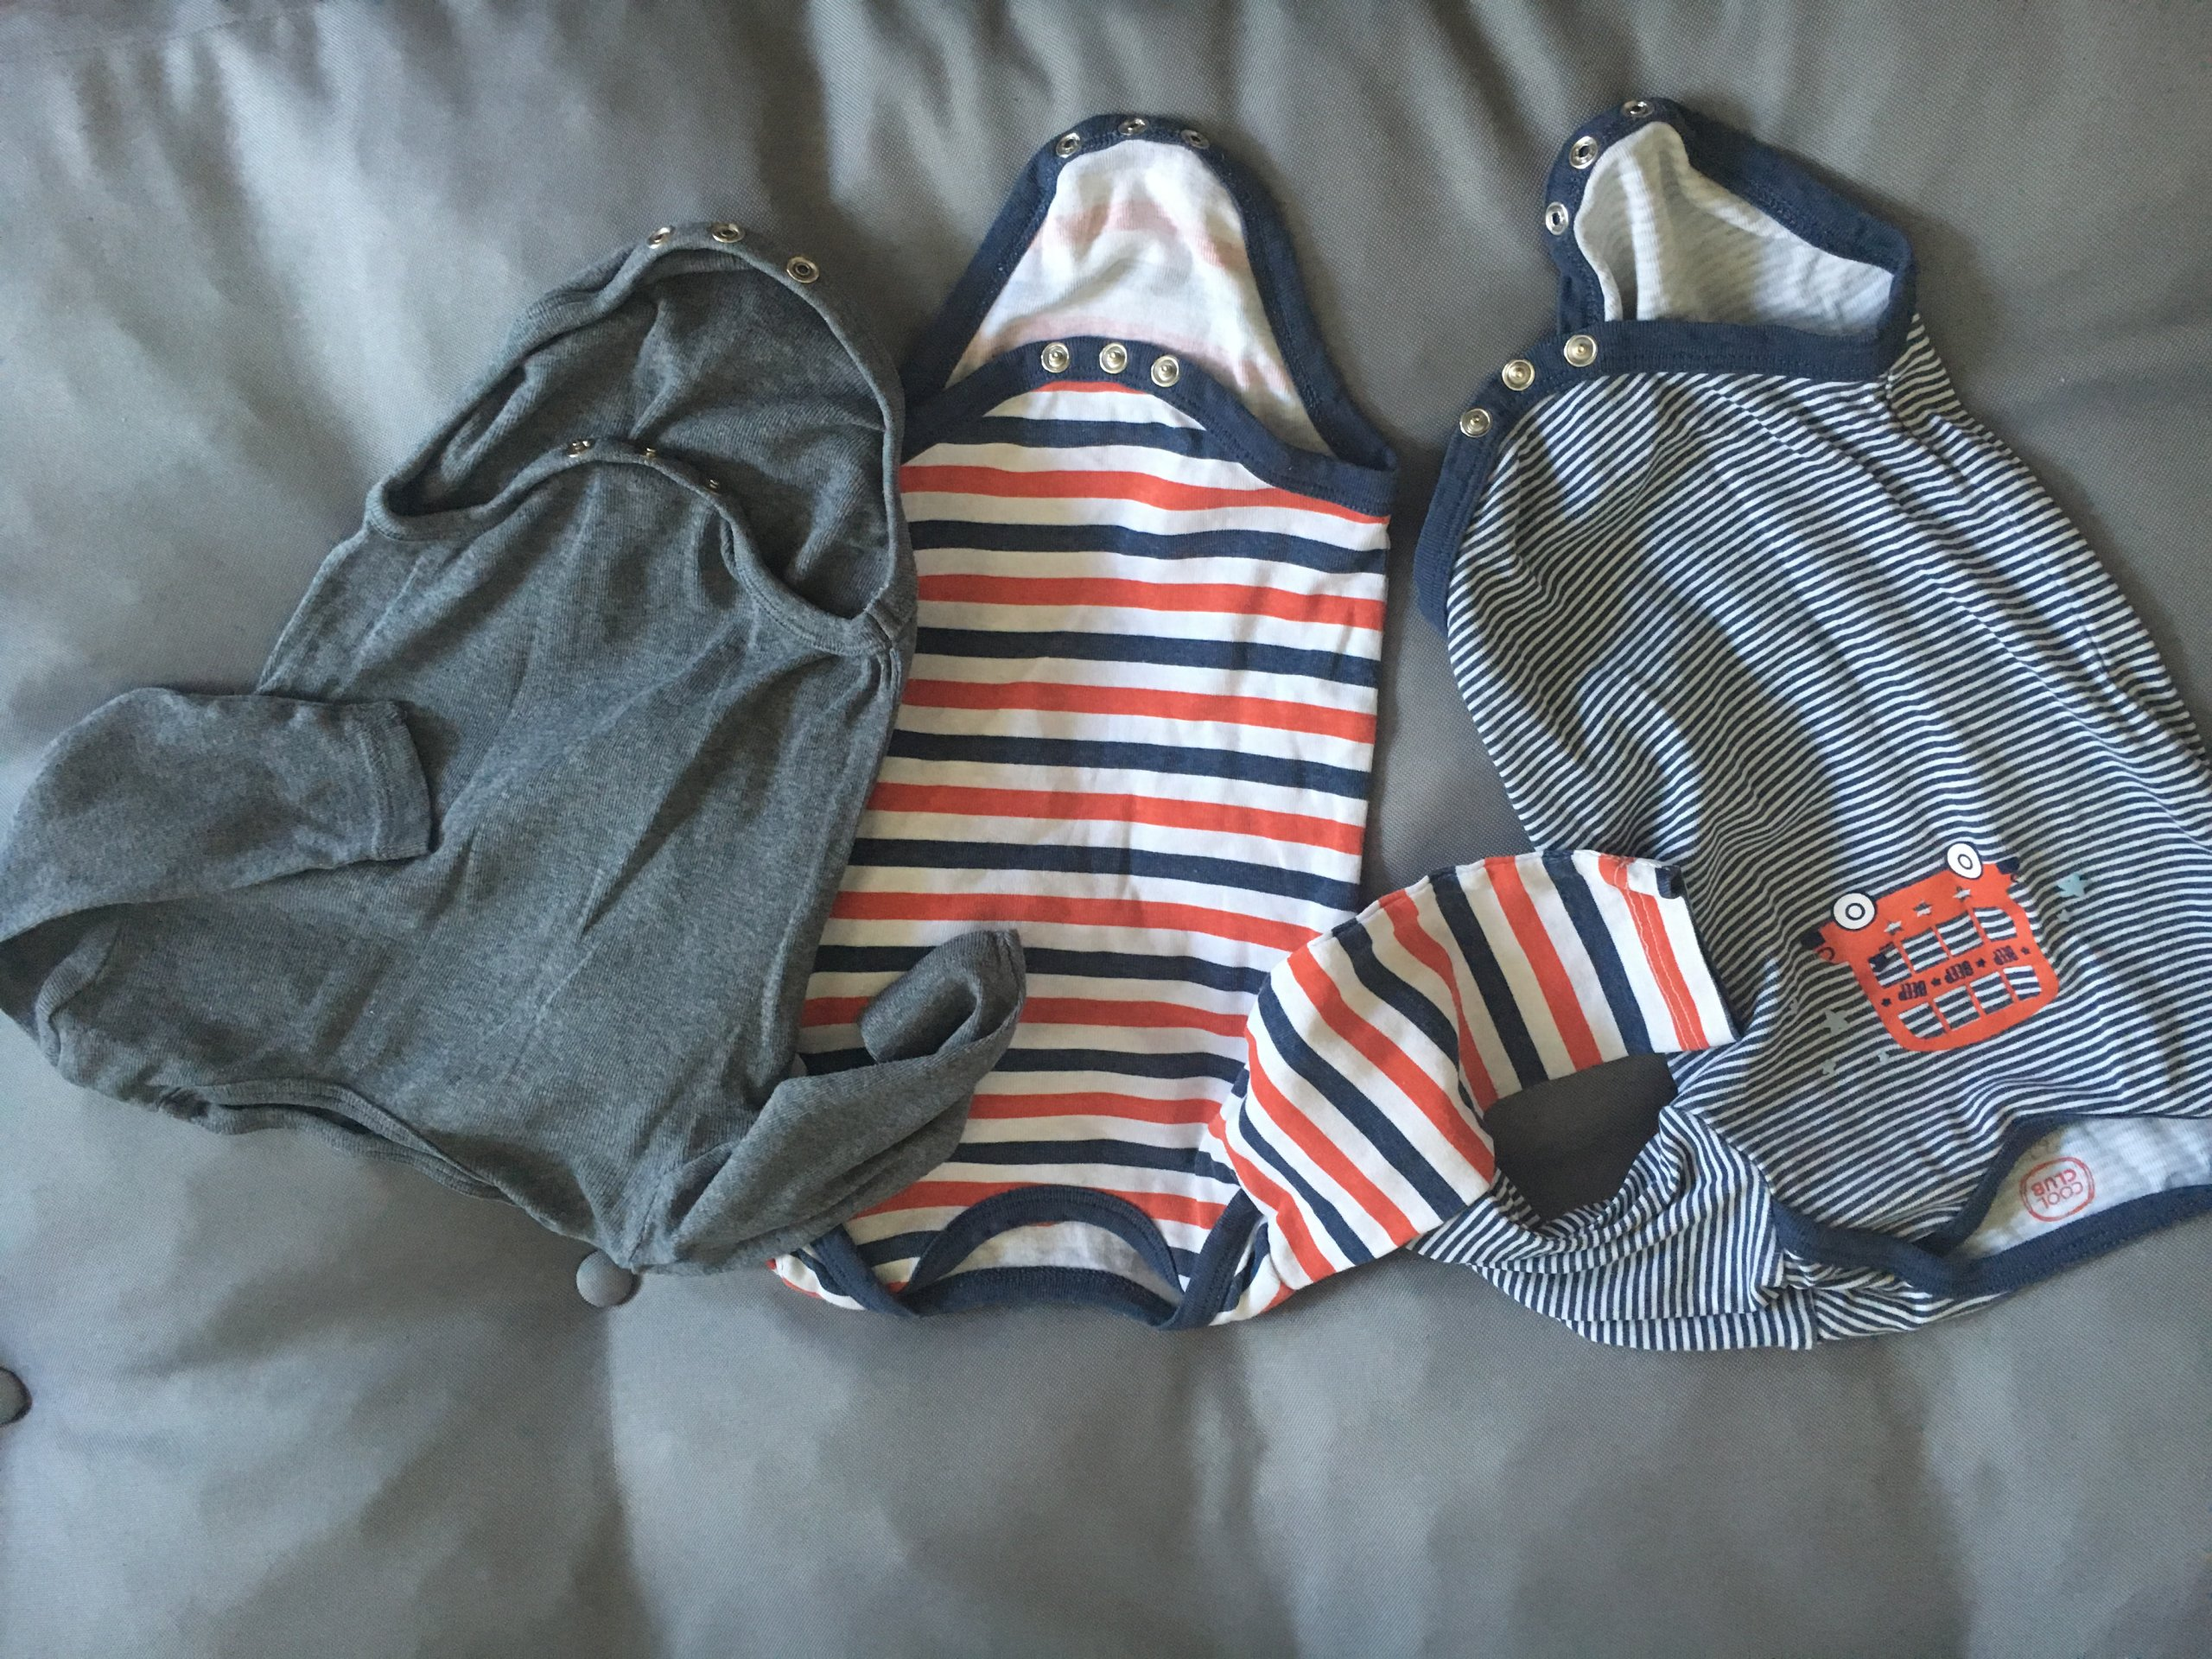 6b60ba38e750e Markowe ubranka dla niemowlaka 50 sztuk + gratis - 6979817072 ...